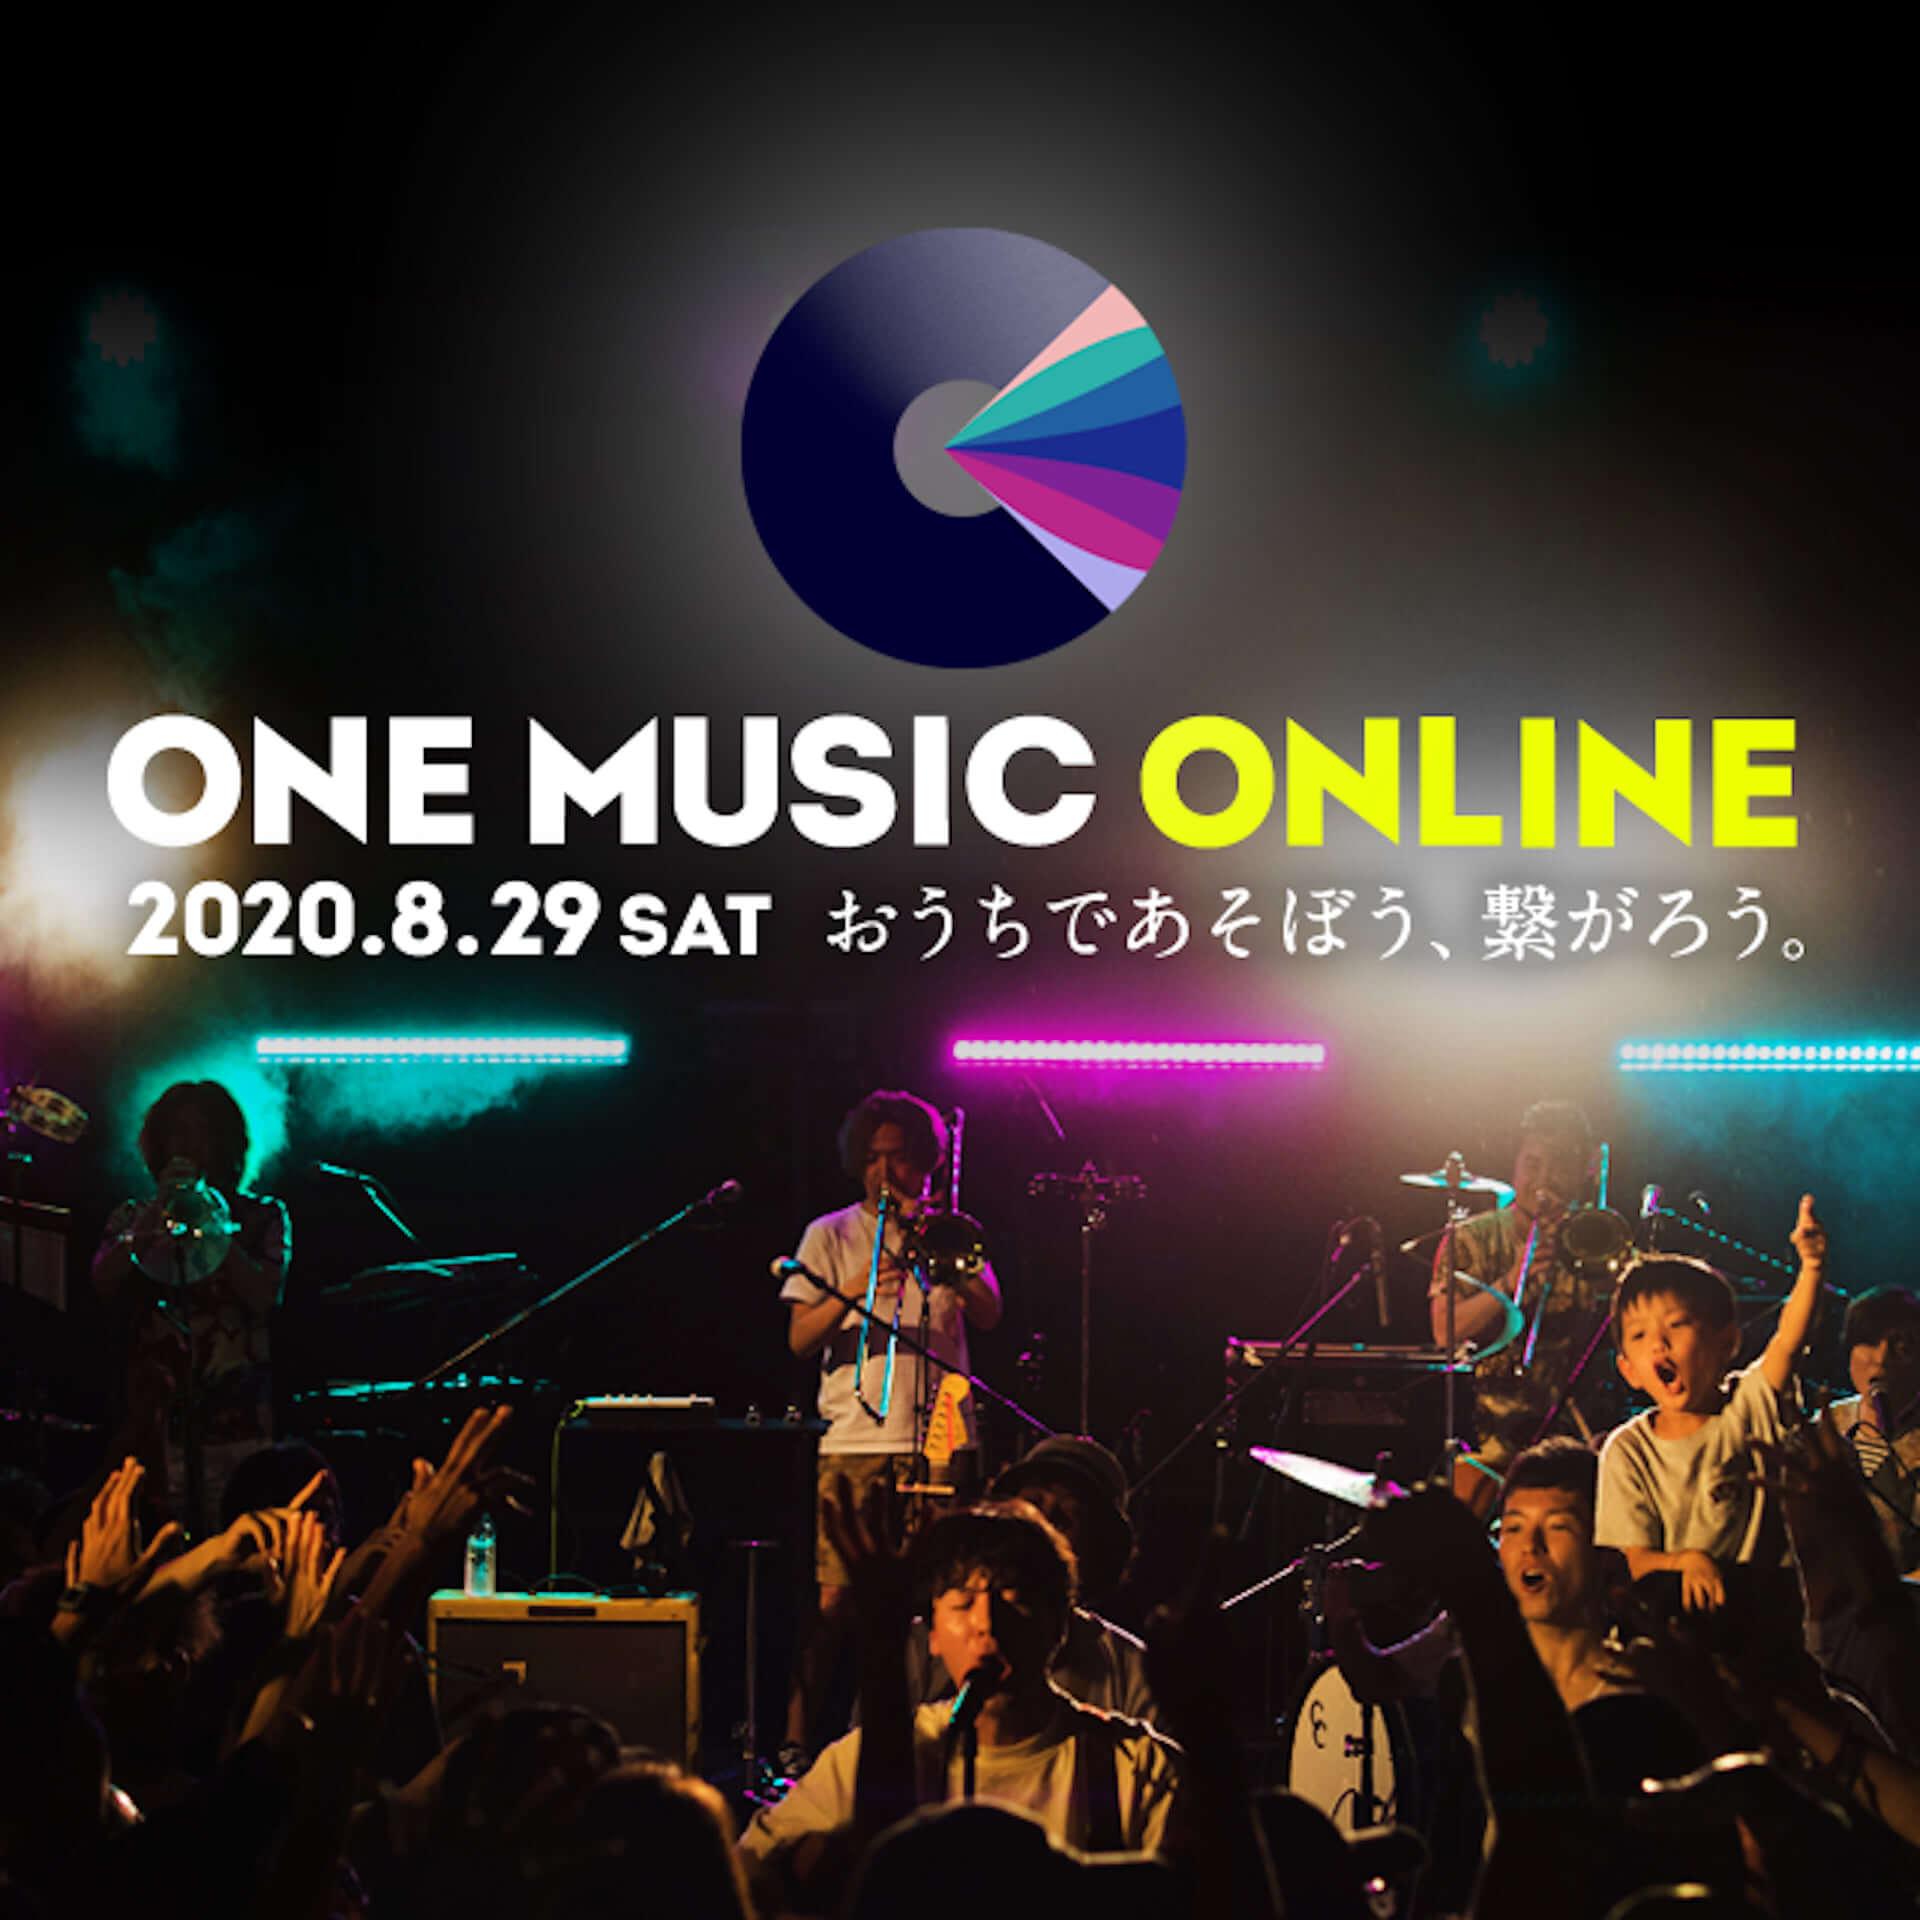 <ONE MUSIC ONLINE>出演アーティストが決定!サニーデイ・サービス、環ROY、Emeraldがラインナップ music200814_onemusiconline_4-1920x1920